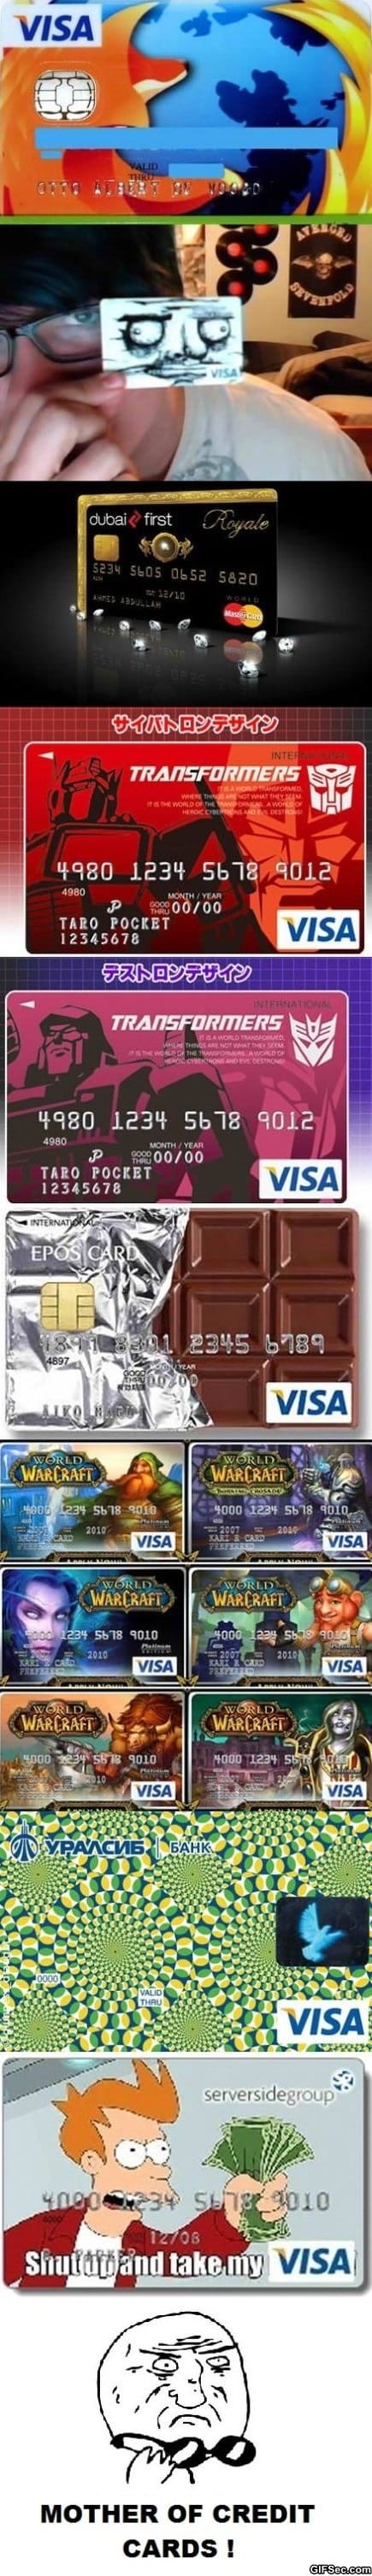 credit-cards-meme